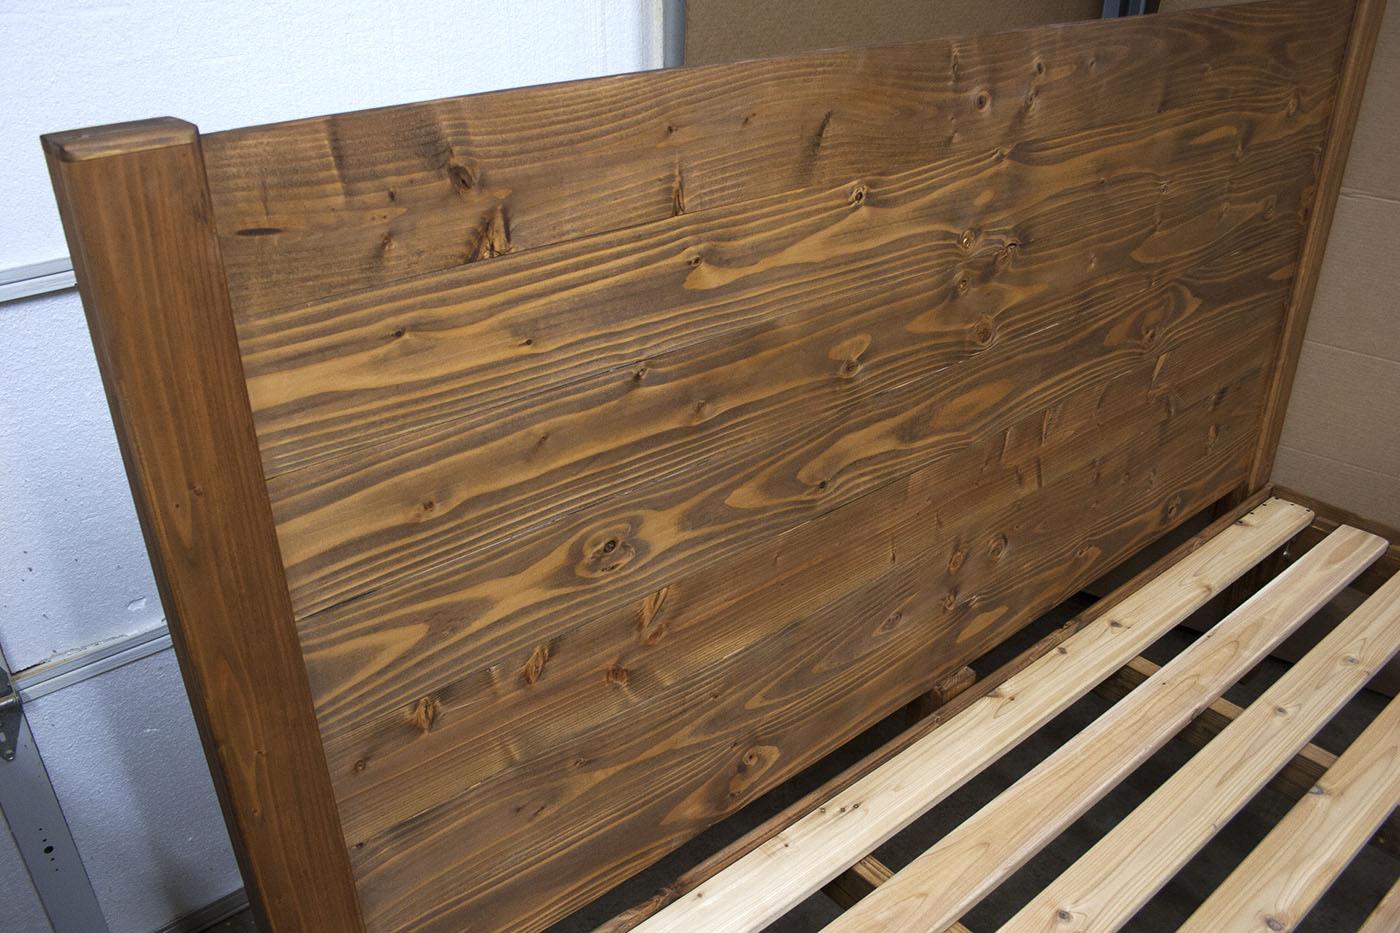 Panel-style headboard w/ darkening solution, shellac